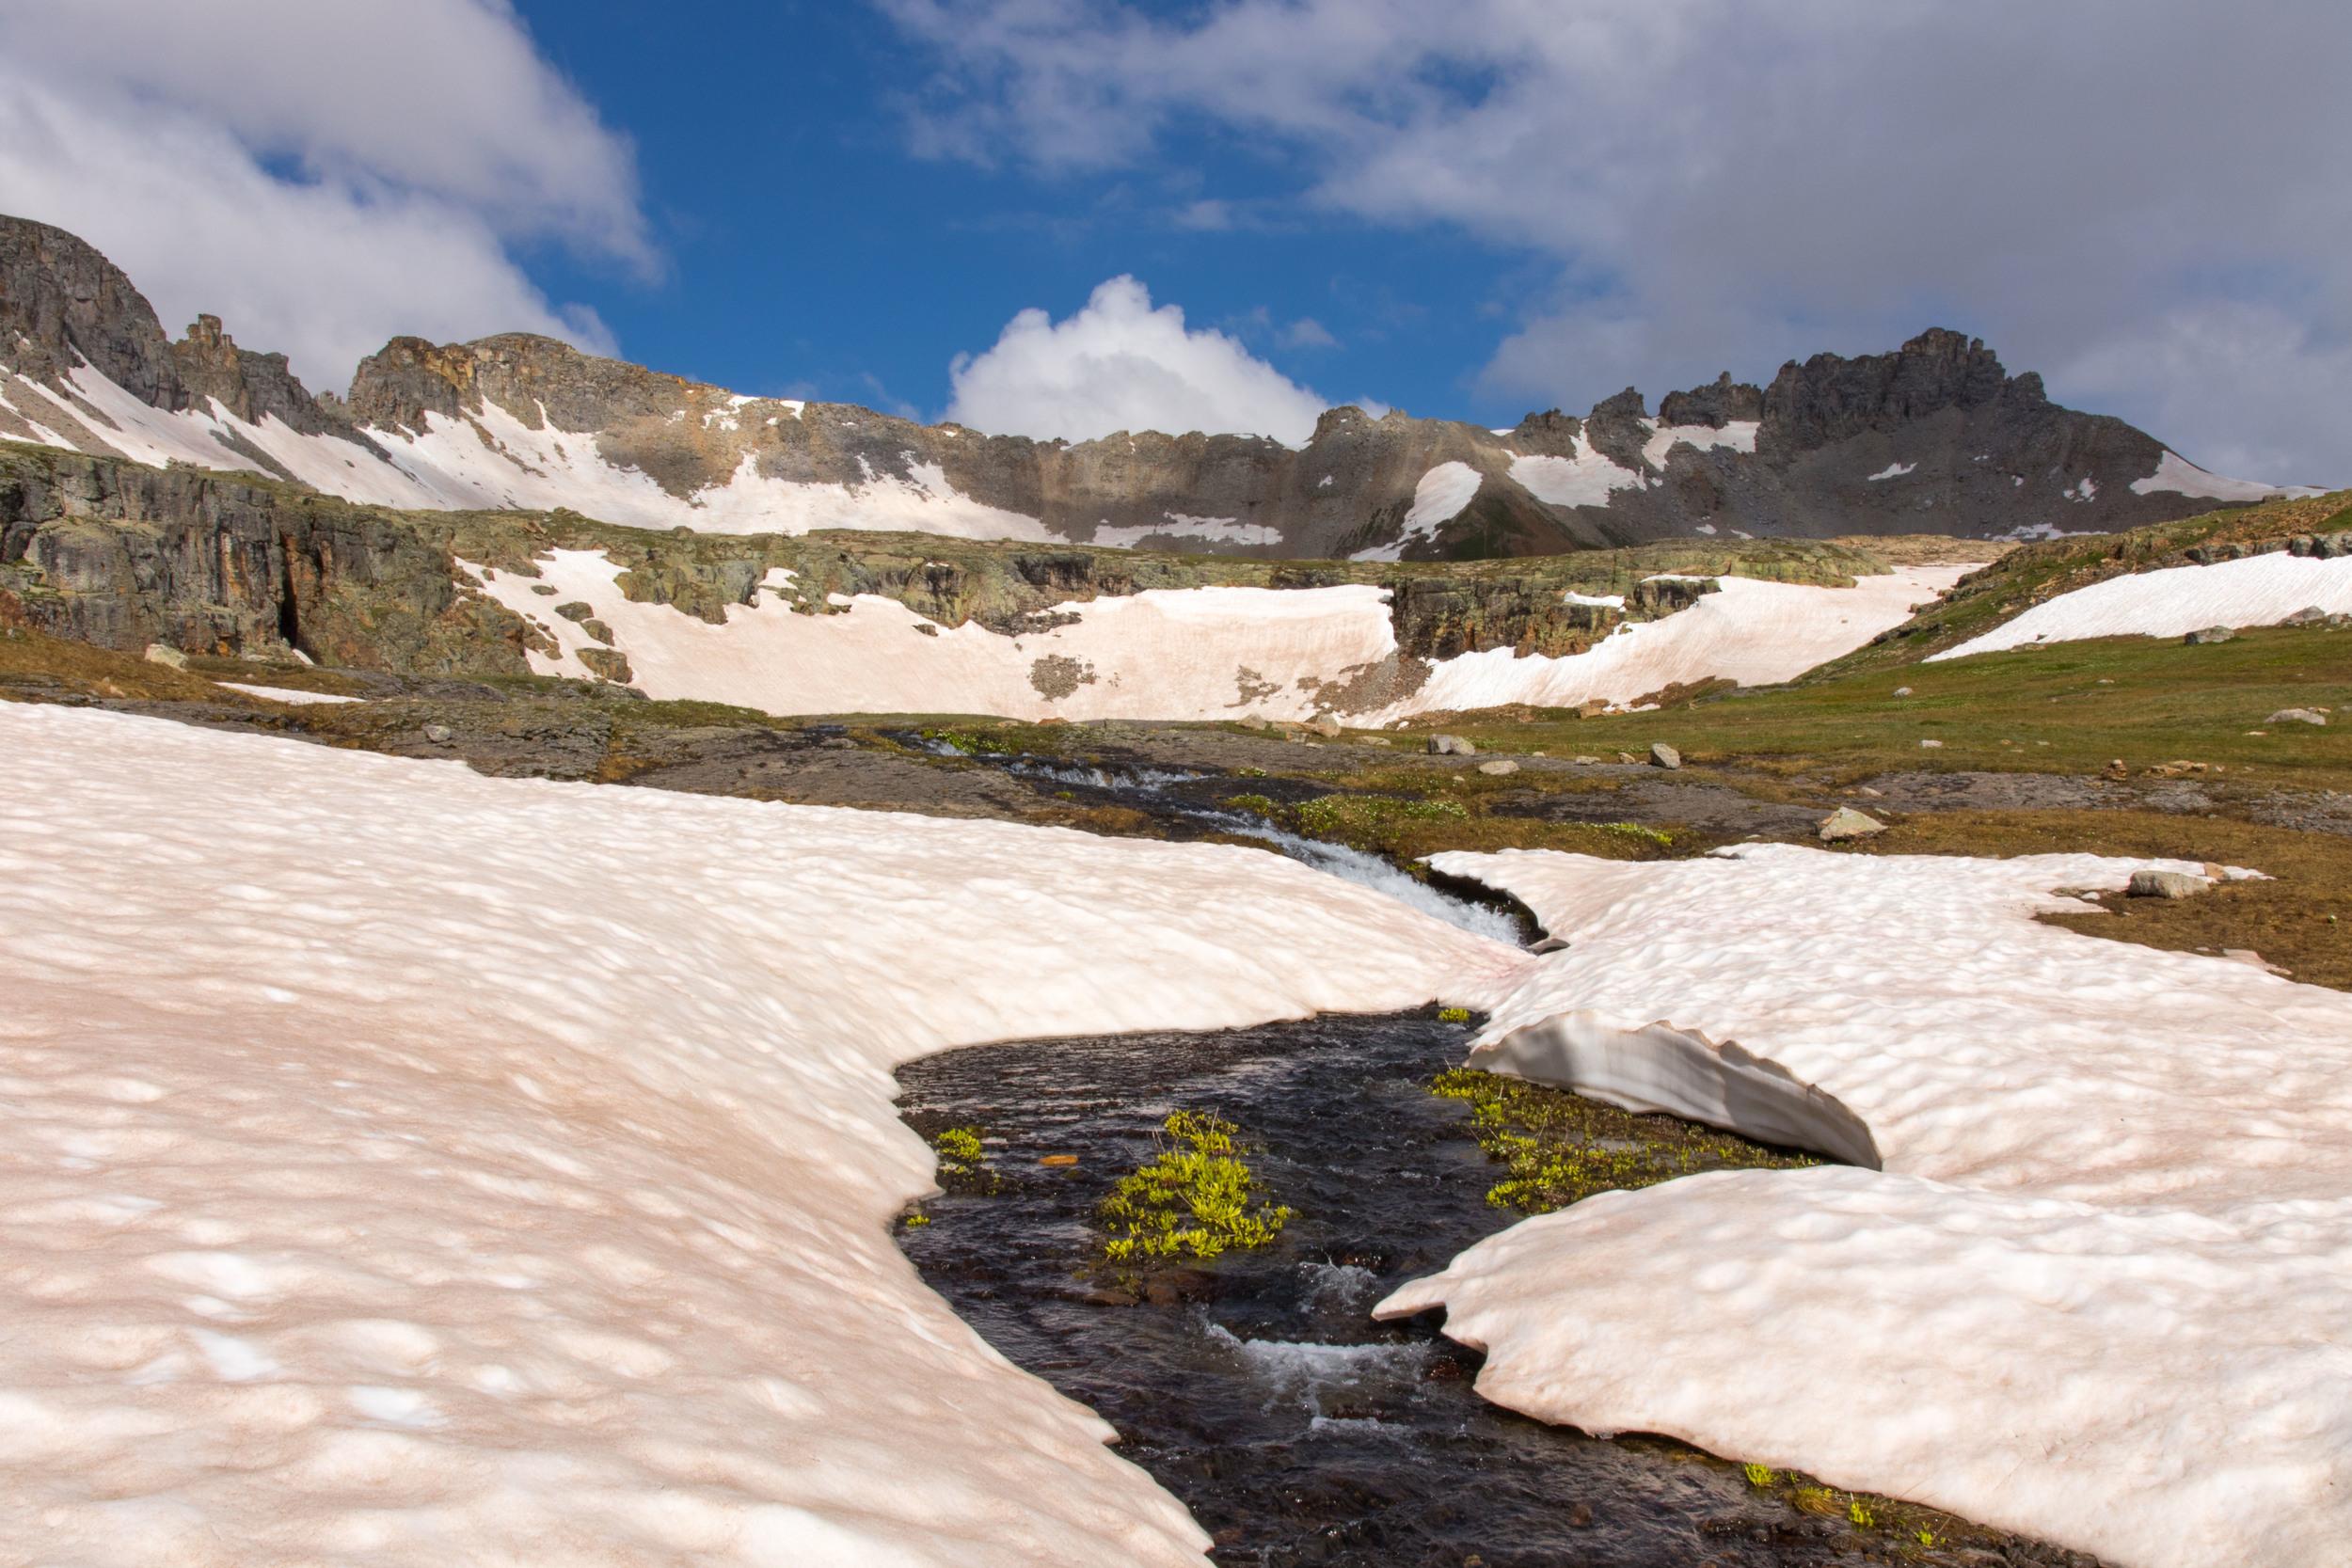 Stream running through snowfield at Porphyry Basin, Image #5326